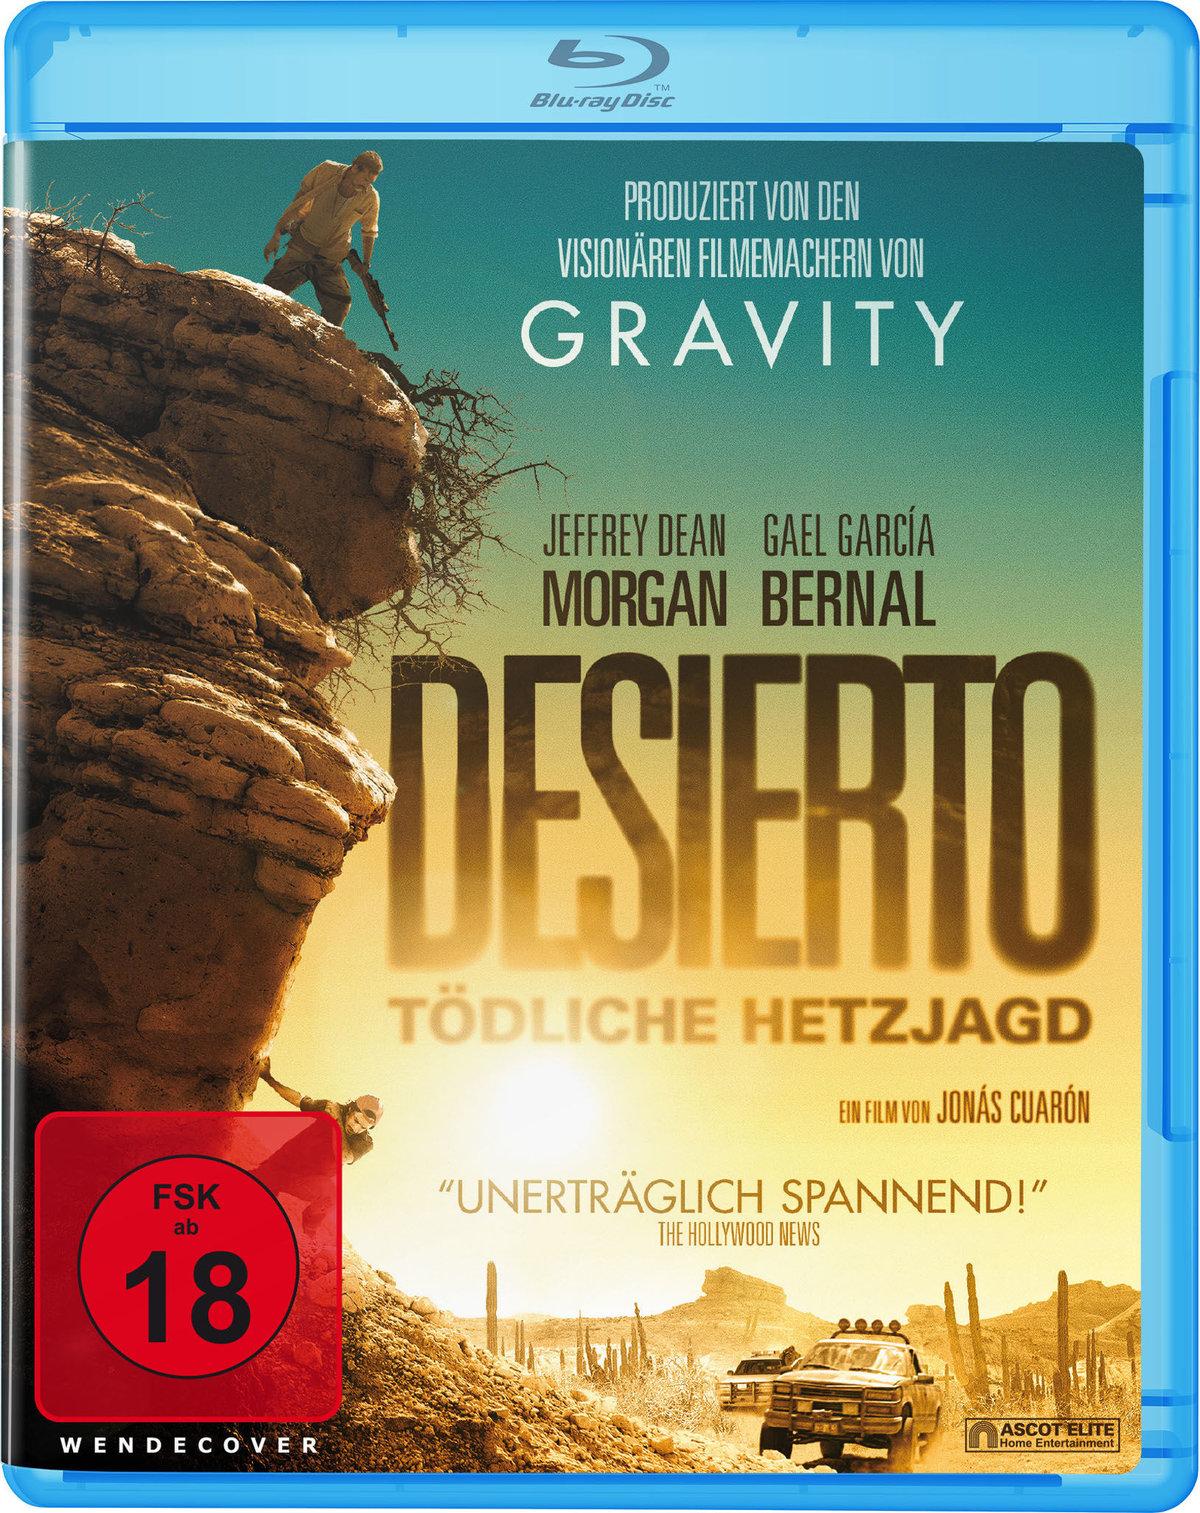 Desierto - Tödliche Hetzjagd (2015)